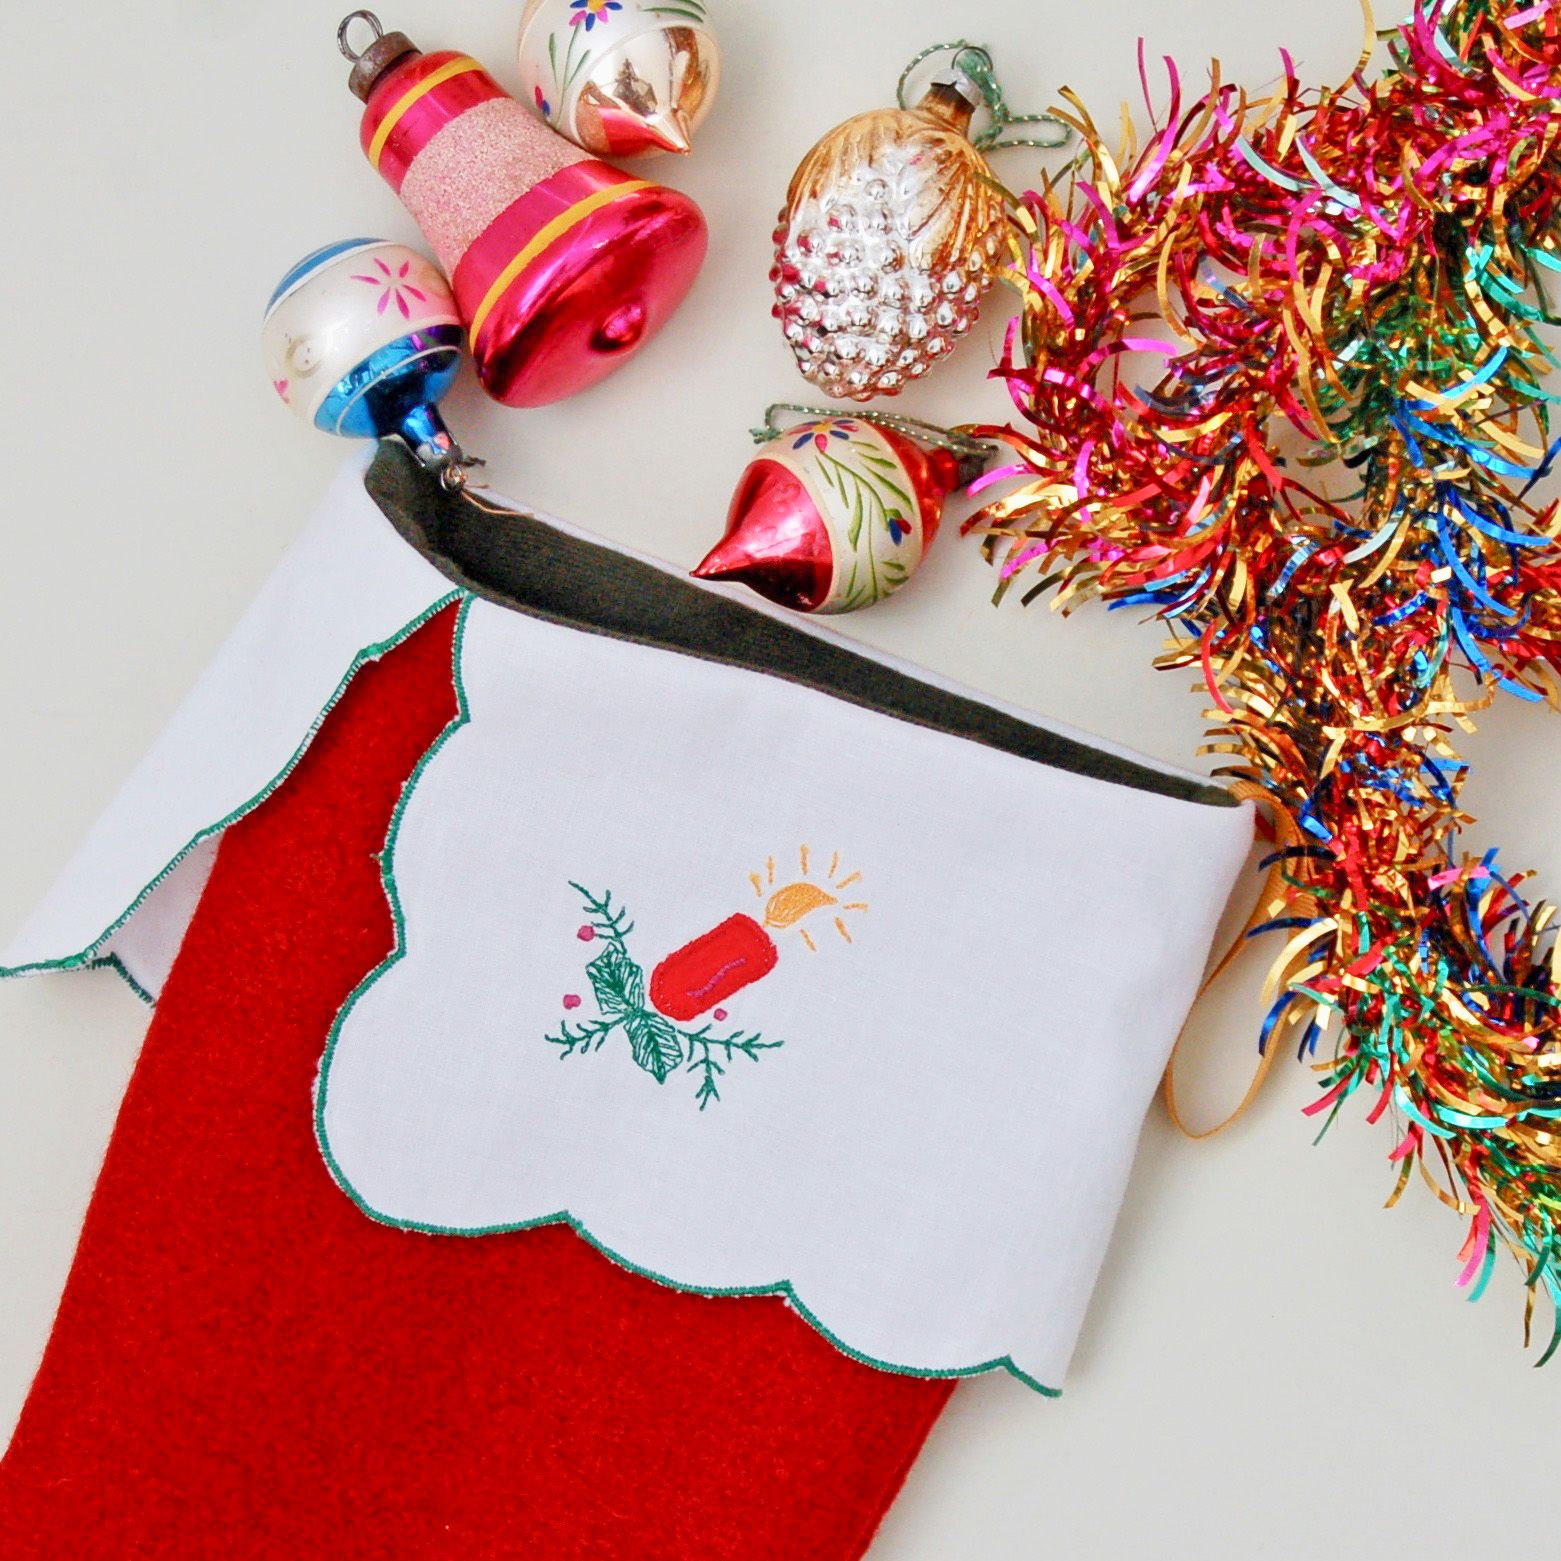 christmasstocking9.jpg